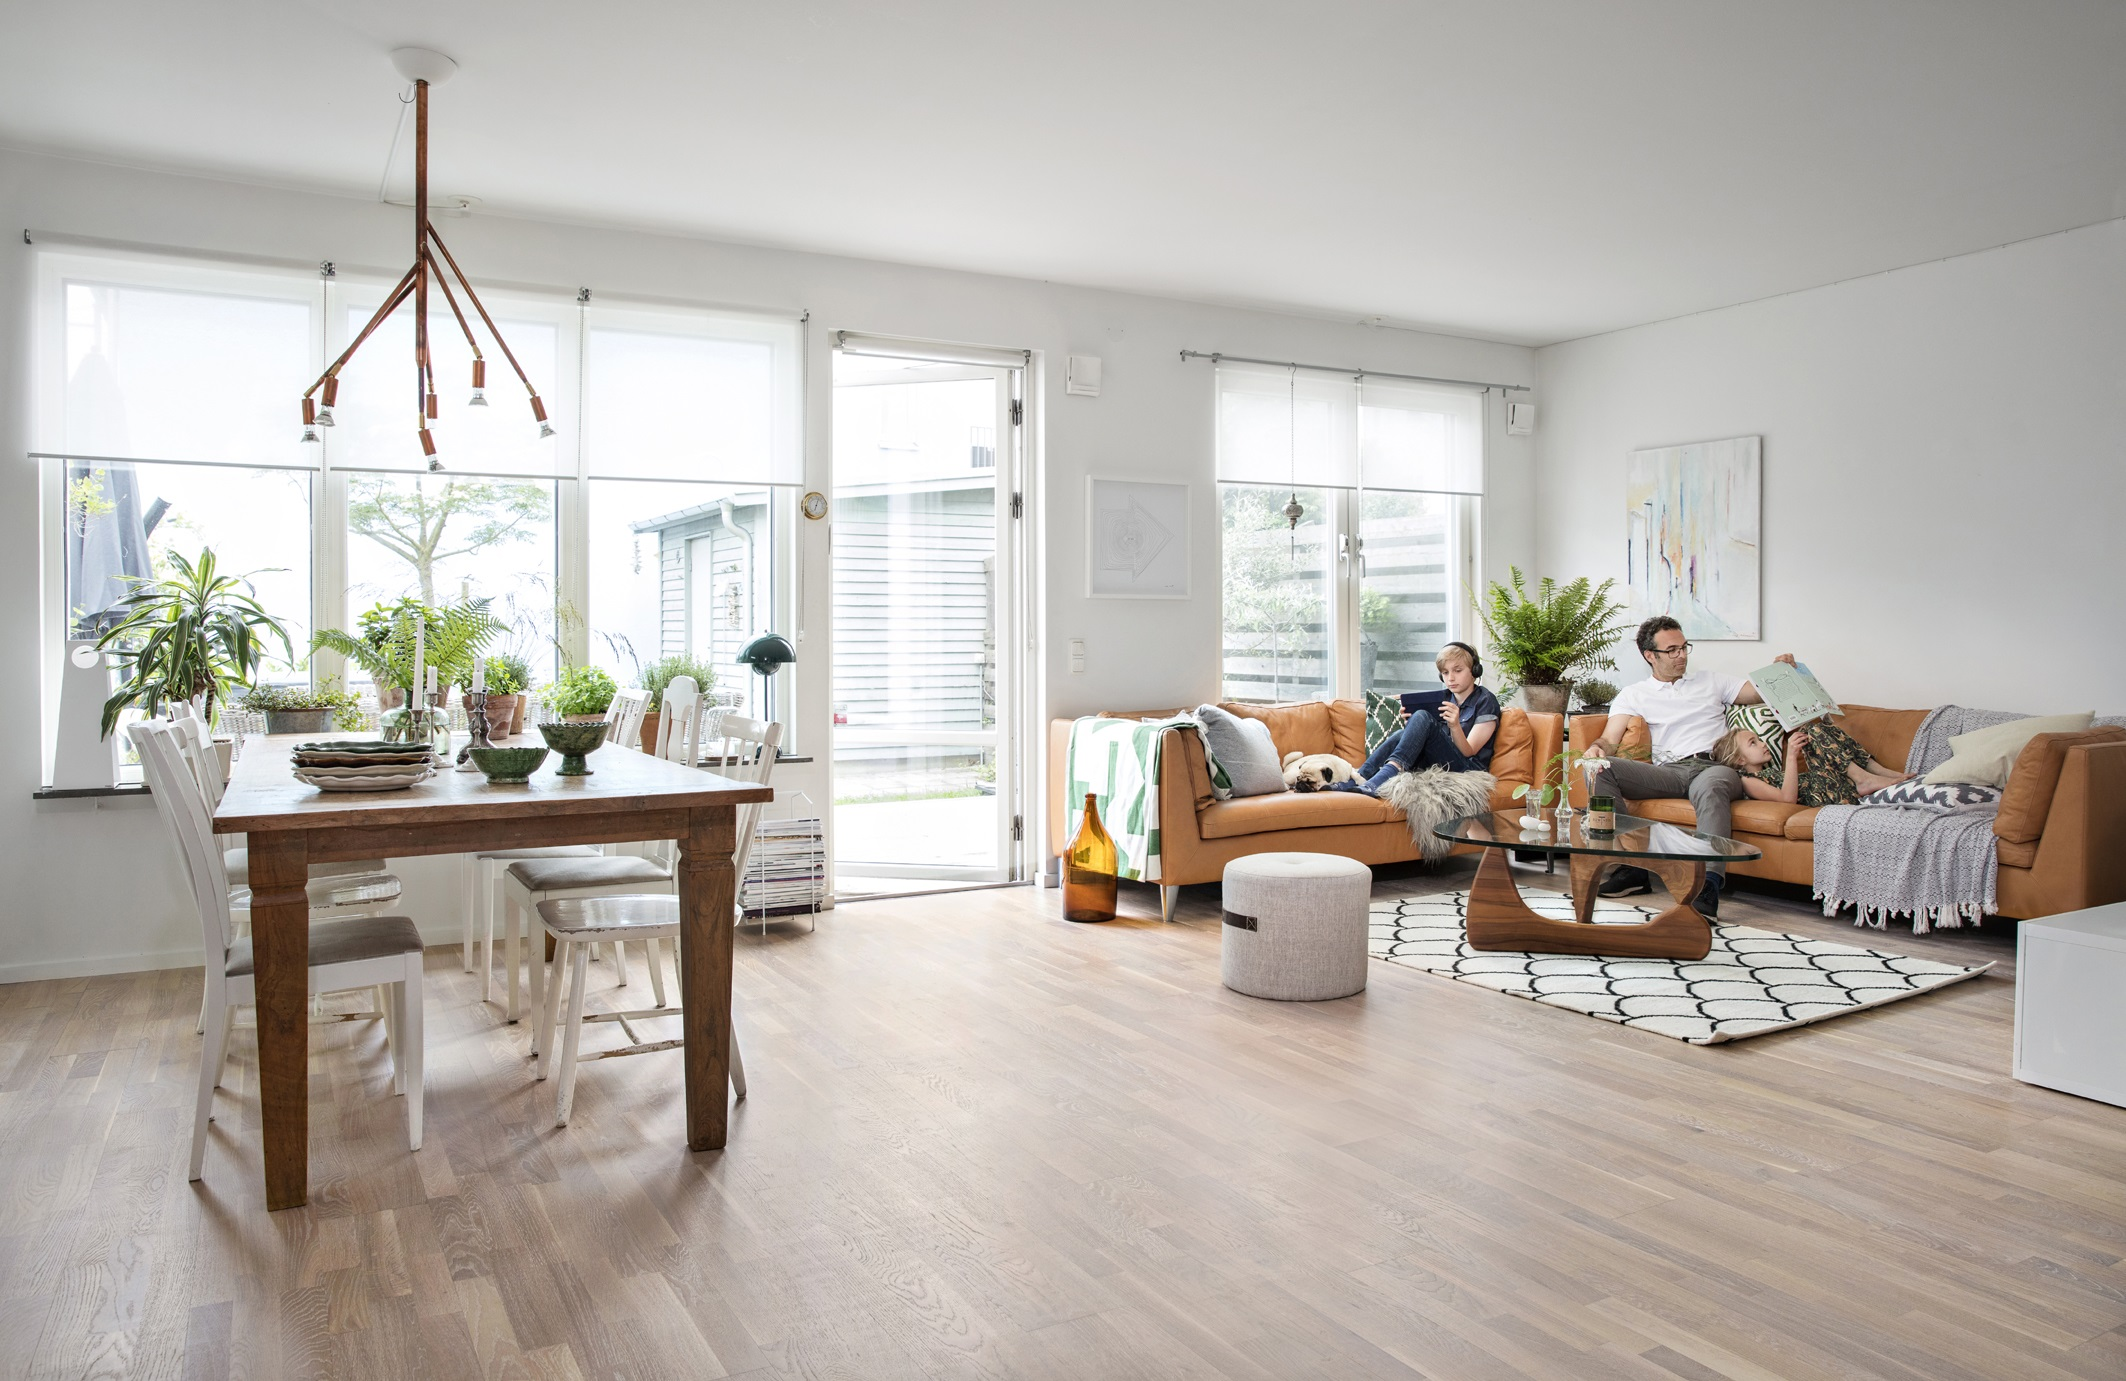 parkett als b hne f r m bel aller stilrichtungen stets. Black Bedroom Furniture Sets. Home Design Ideas